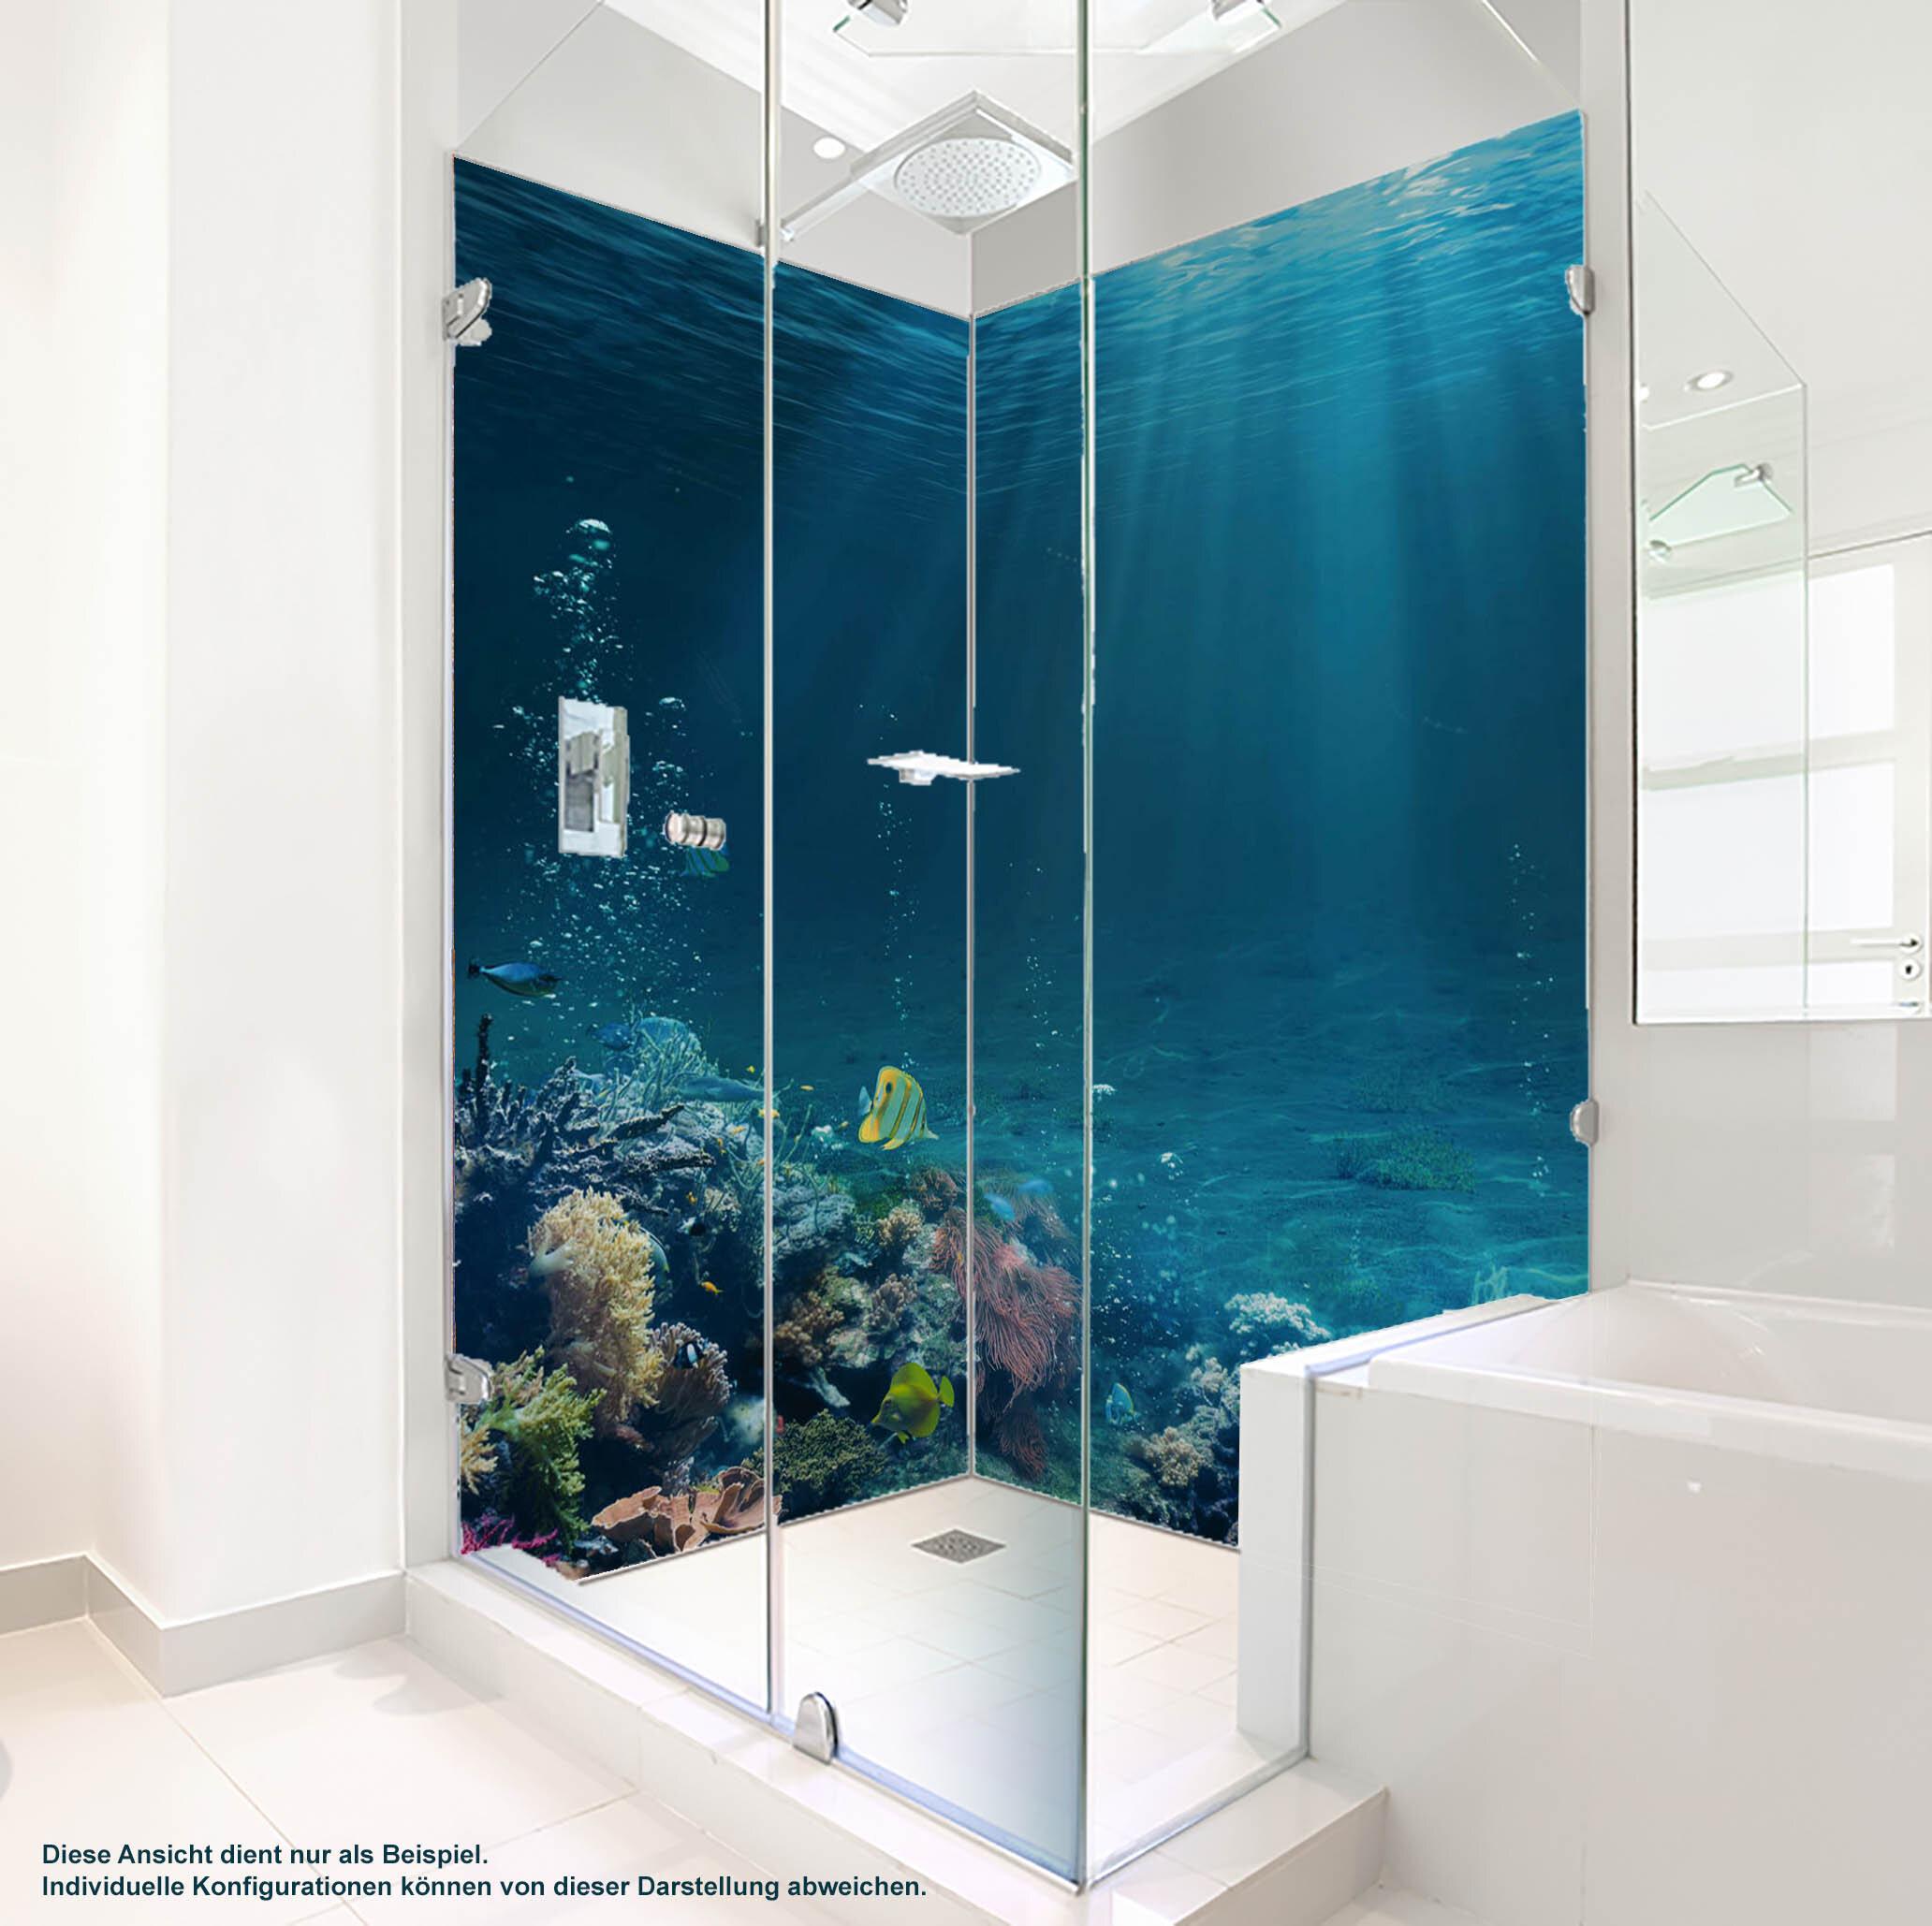 Dusche PlateART Duschrückwand mit Motiv Strand und Meer K_21_20